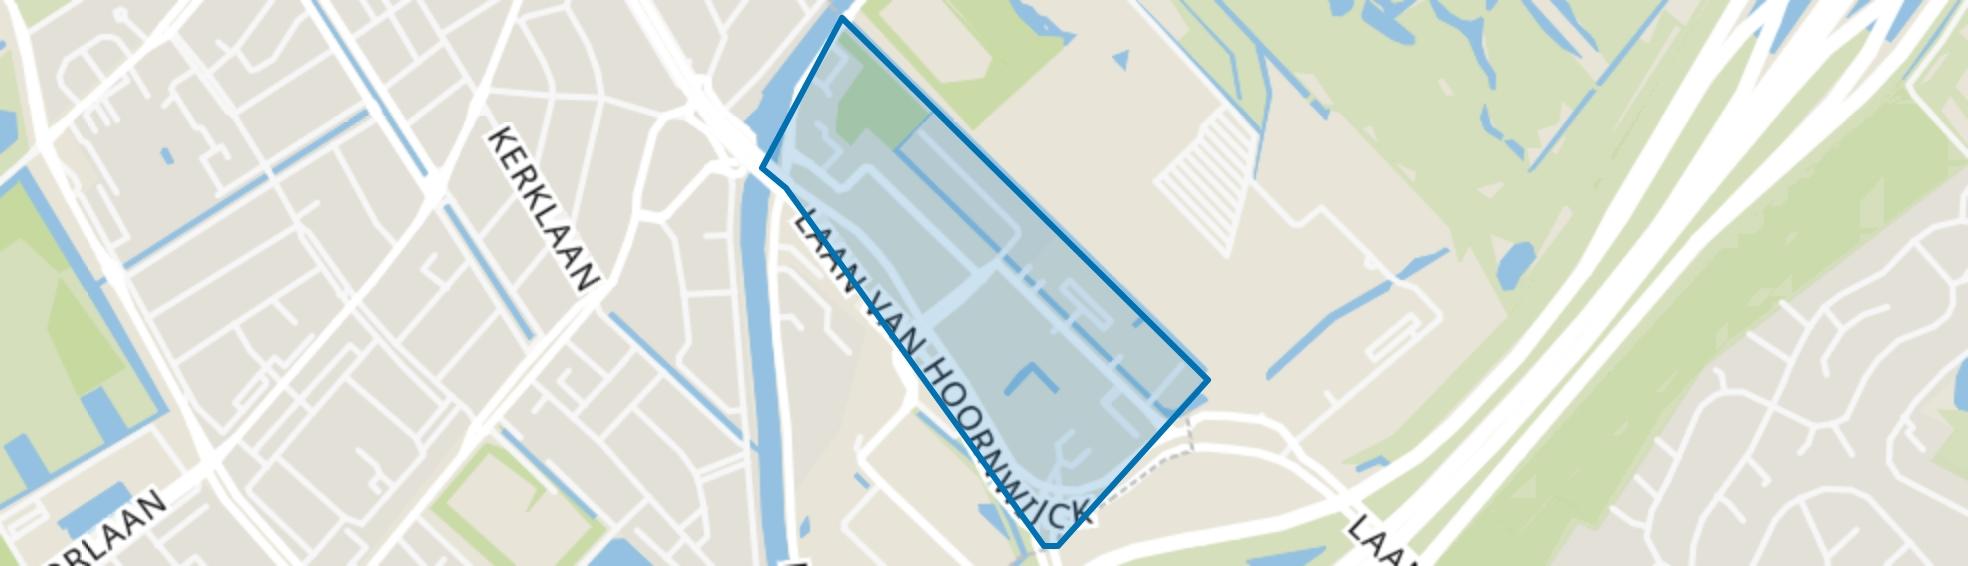 Hoornwijck, Rijswijk (ZH) map